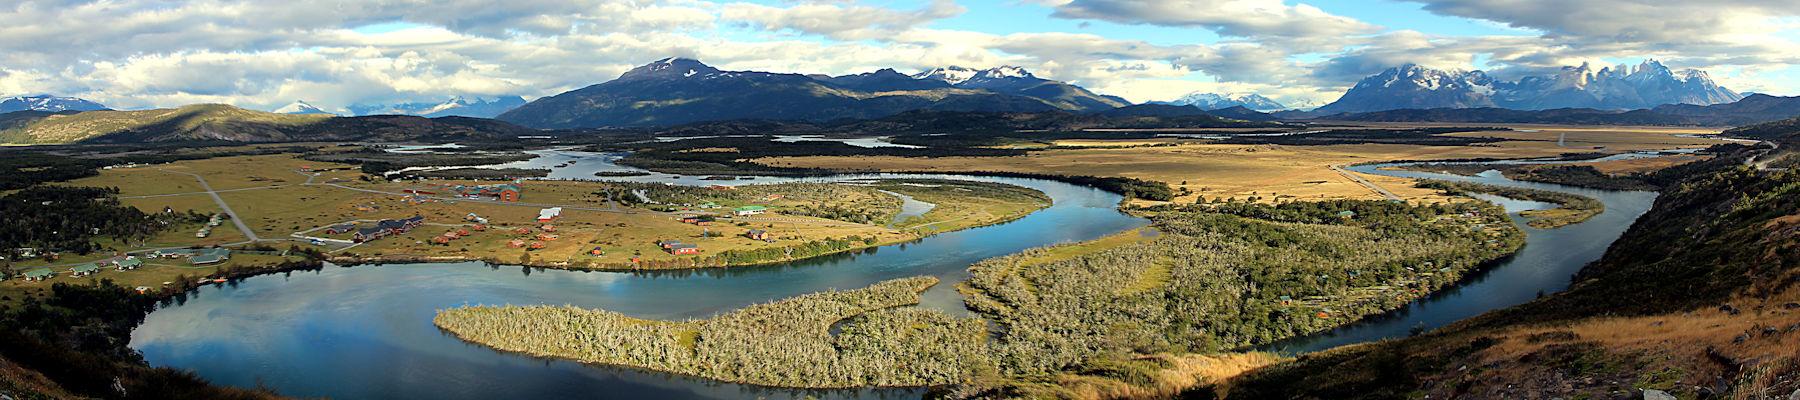 Río Serrano und Torres del Paine